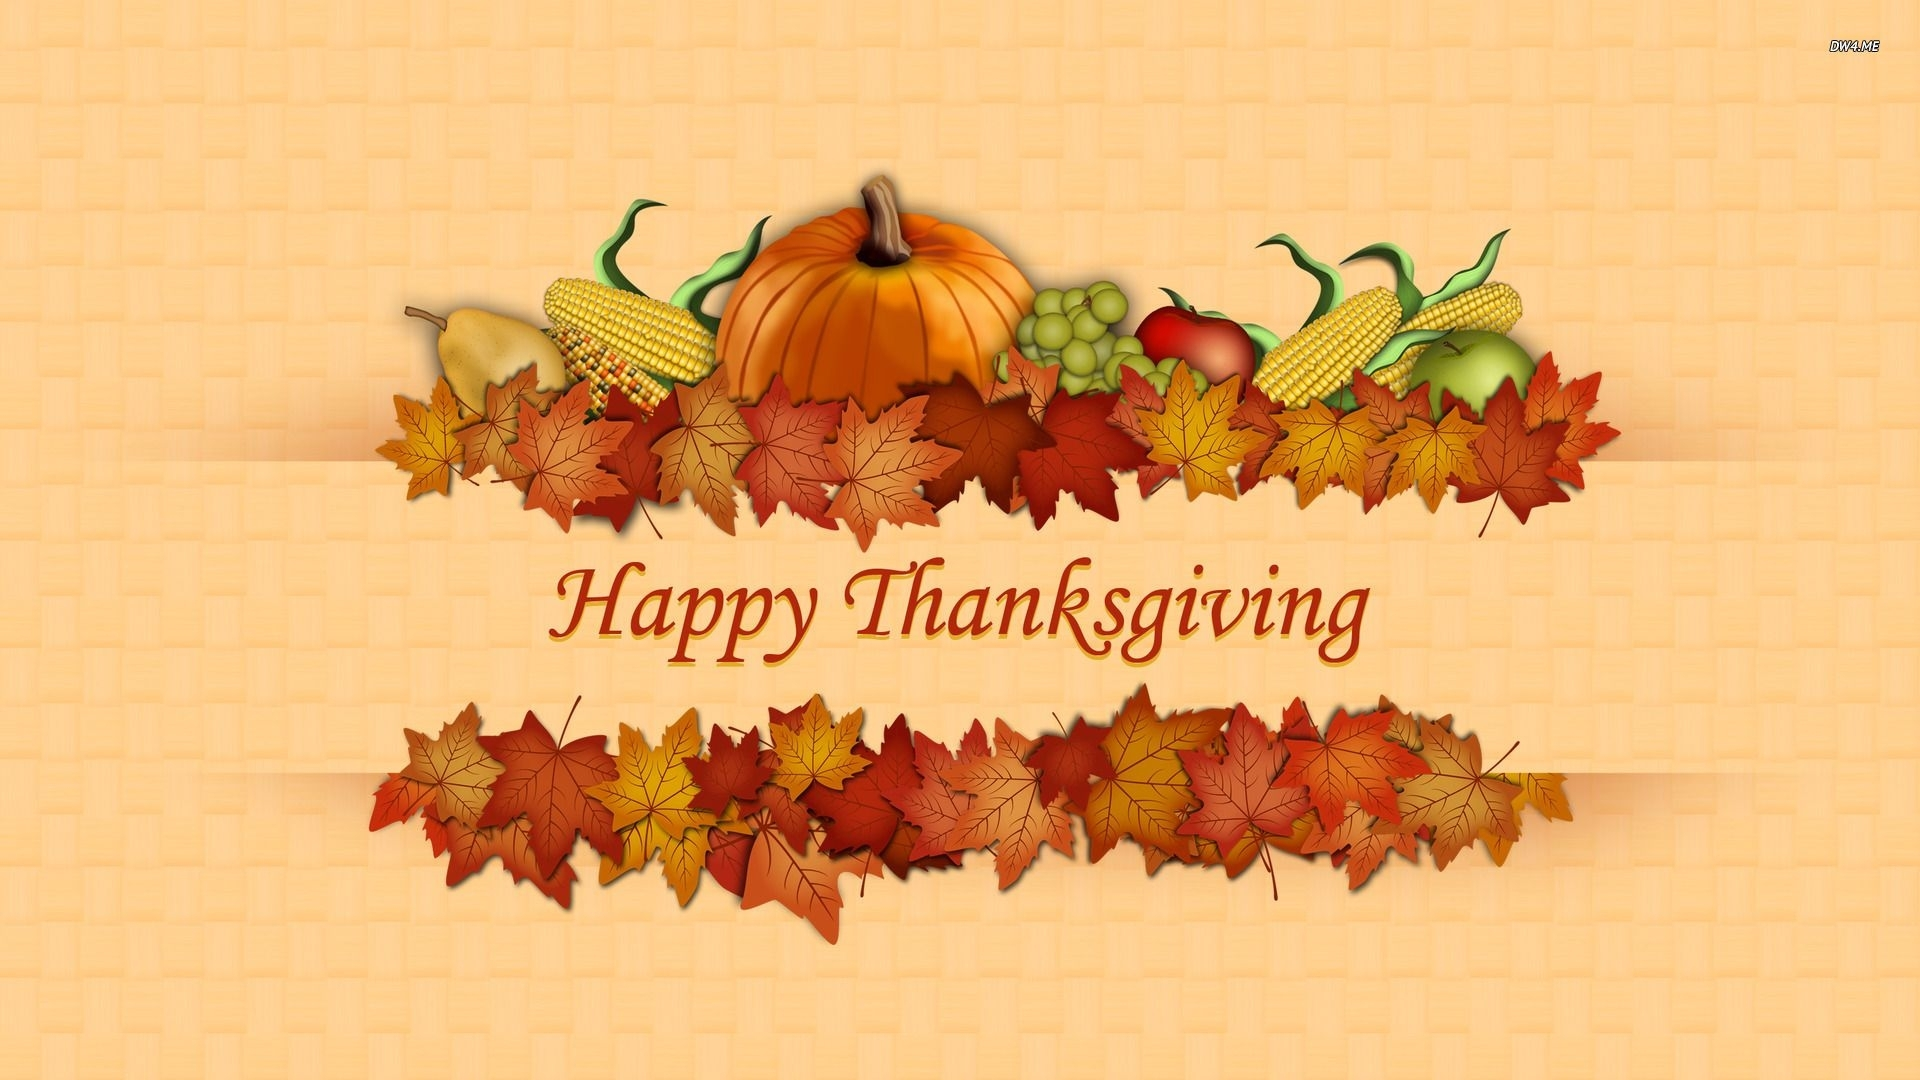 free thanksgiving desktop backgrounds | free happy thanksgiving